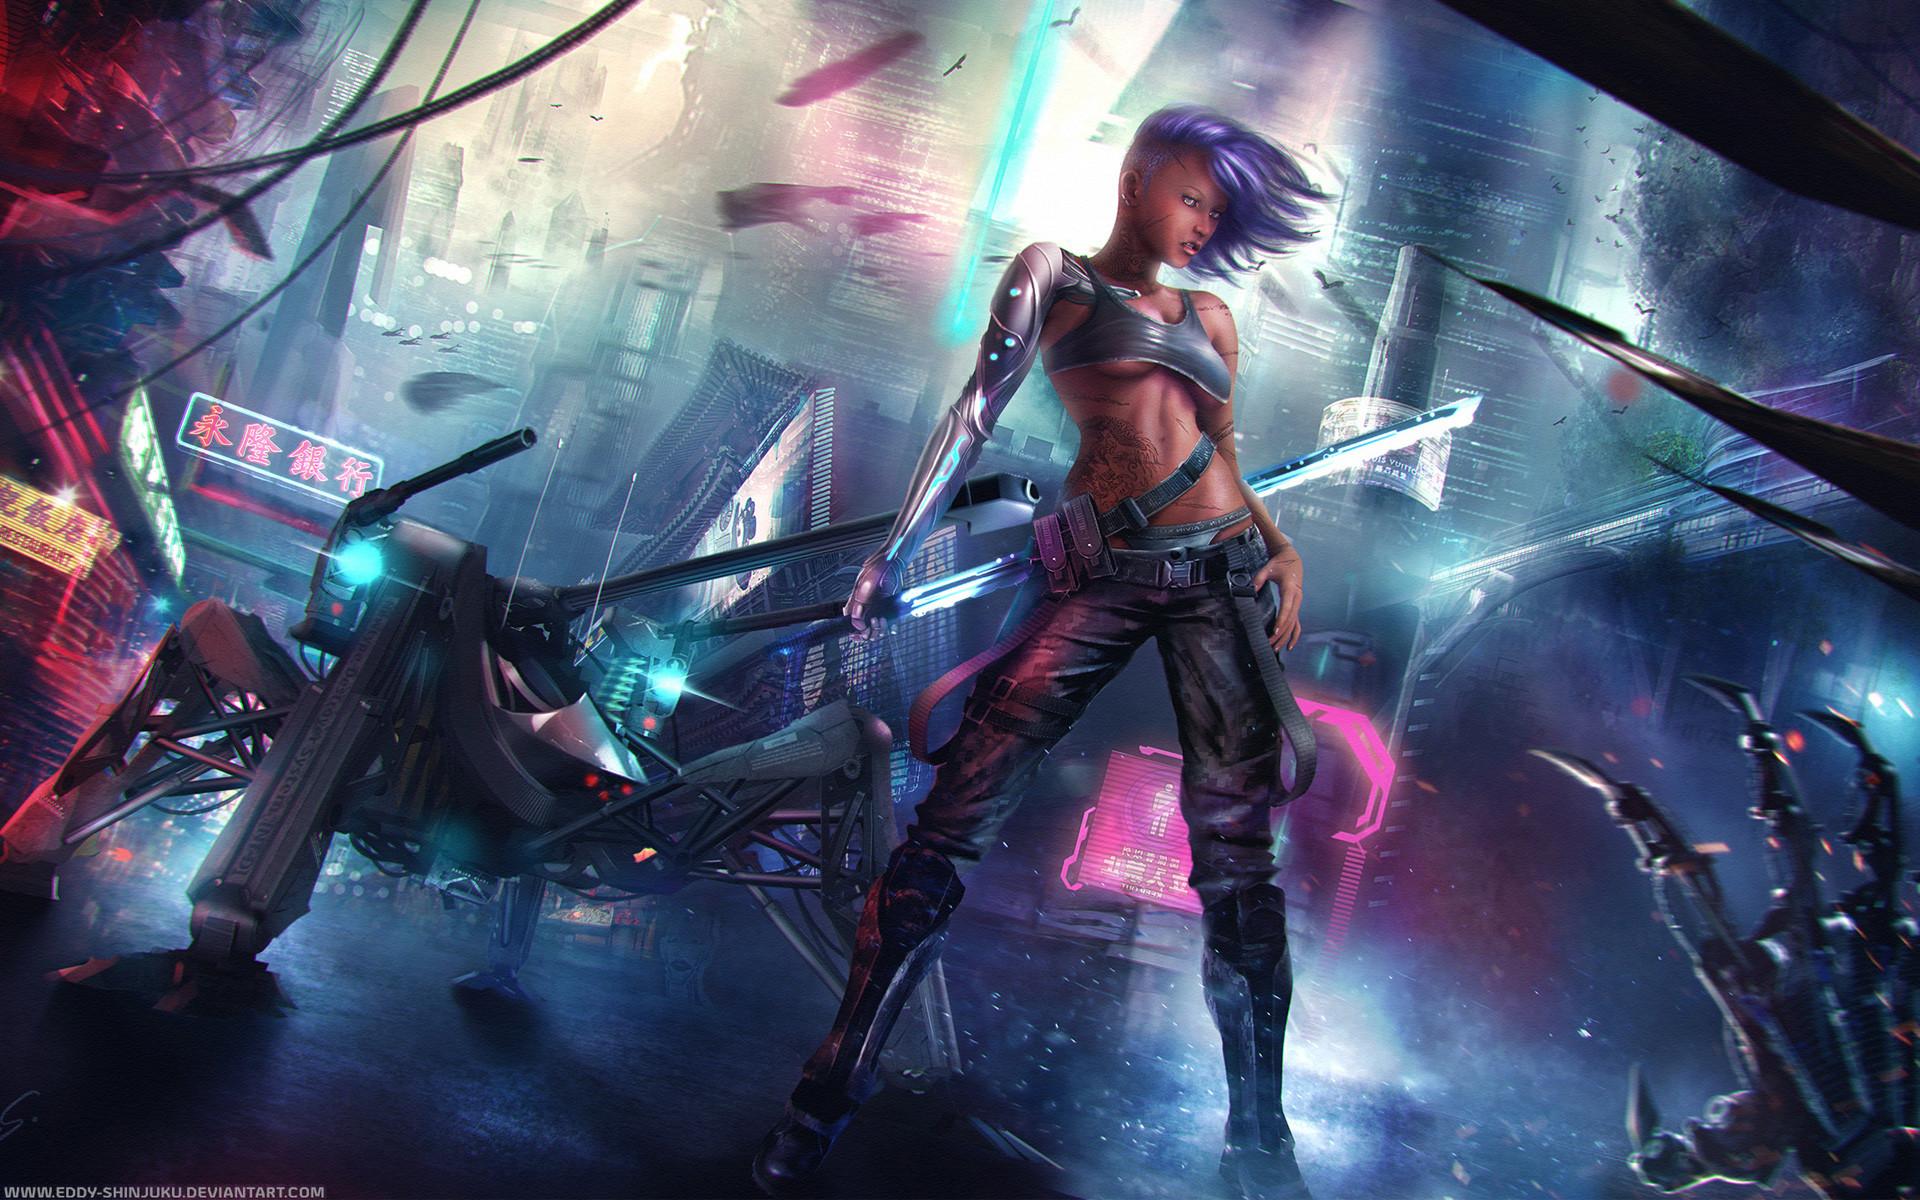 Beautiful Cyberpunk Wallpaper